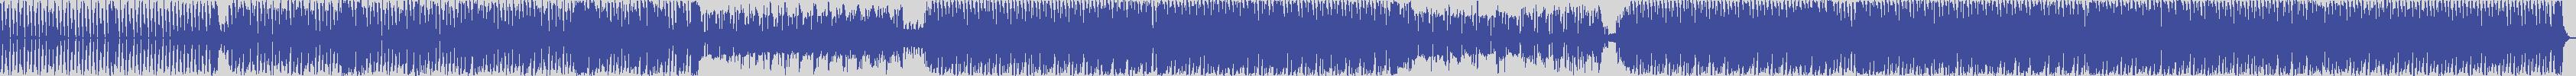 bunny_clan [BYC077] Roberto Parisi - Don't Stop [Original Mix] audio wave form